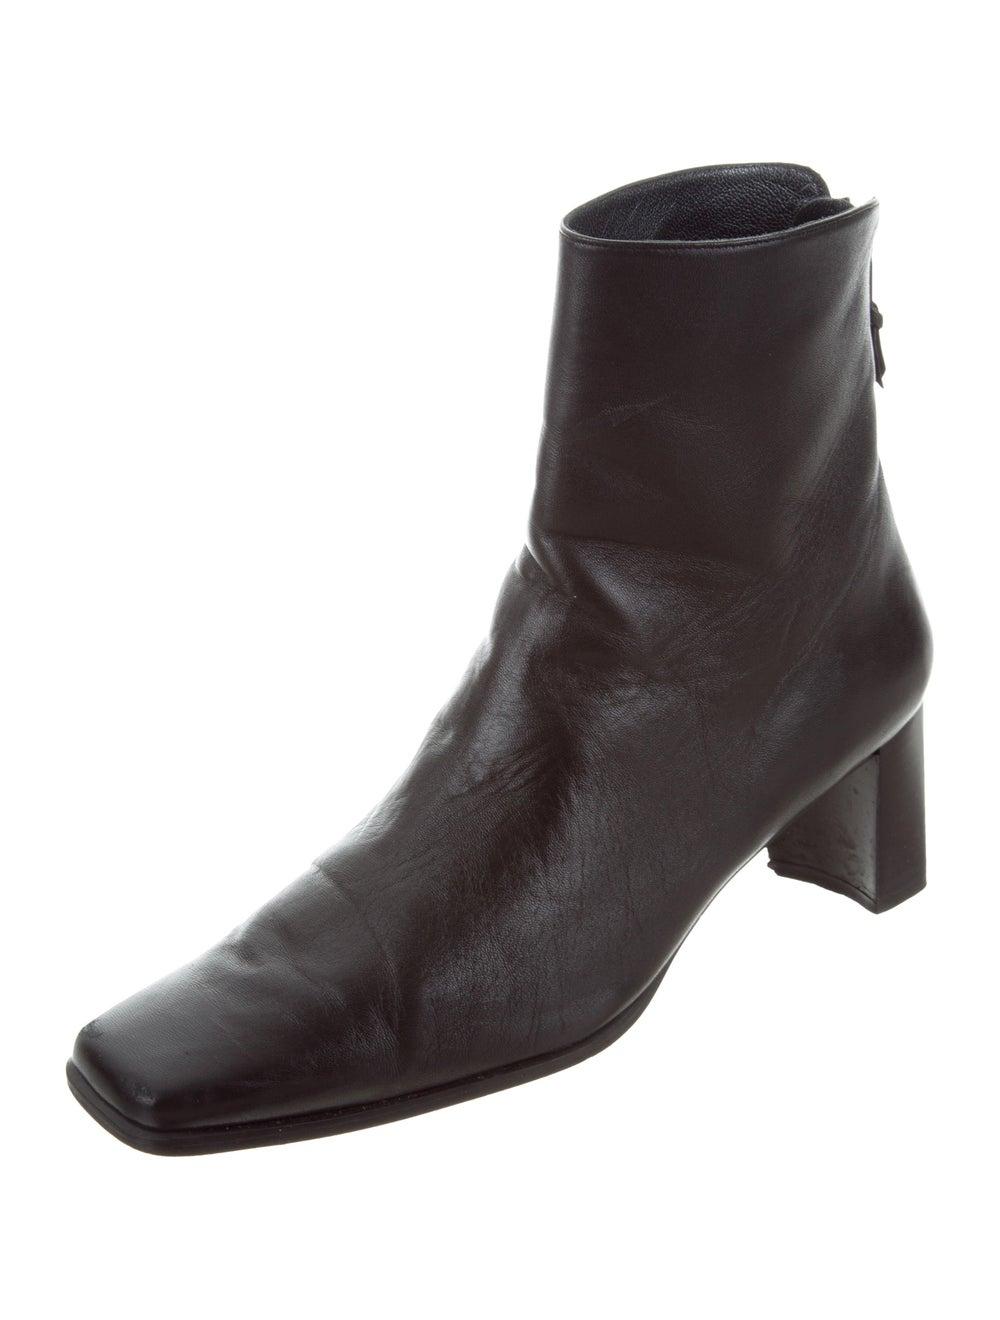 Stuart Weitzman Leather Square-Toe Ankle Boots Bl… - image 2